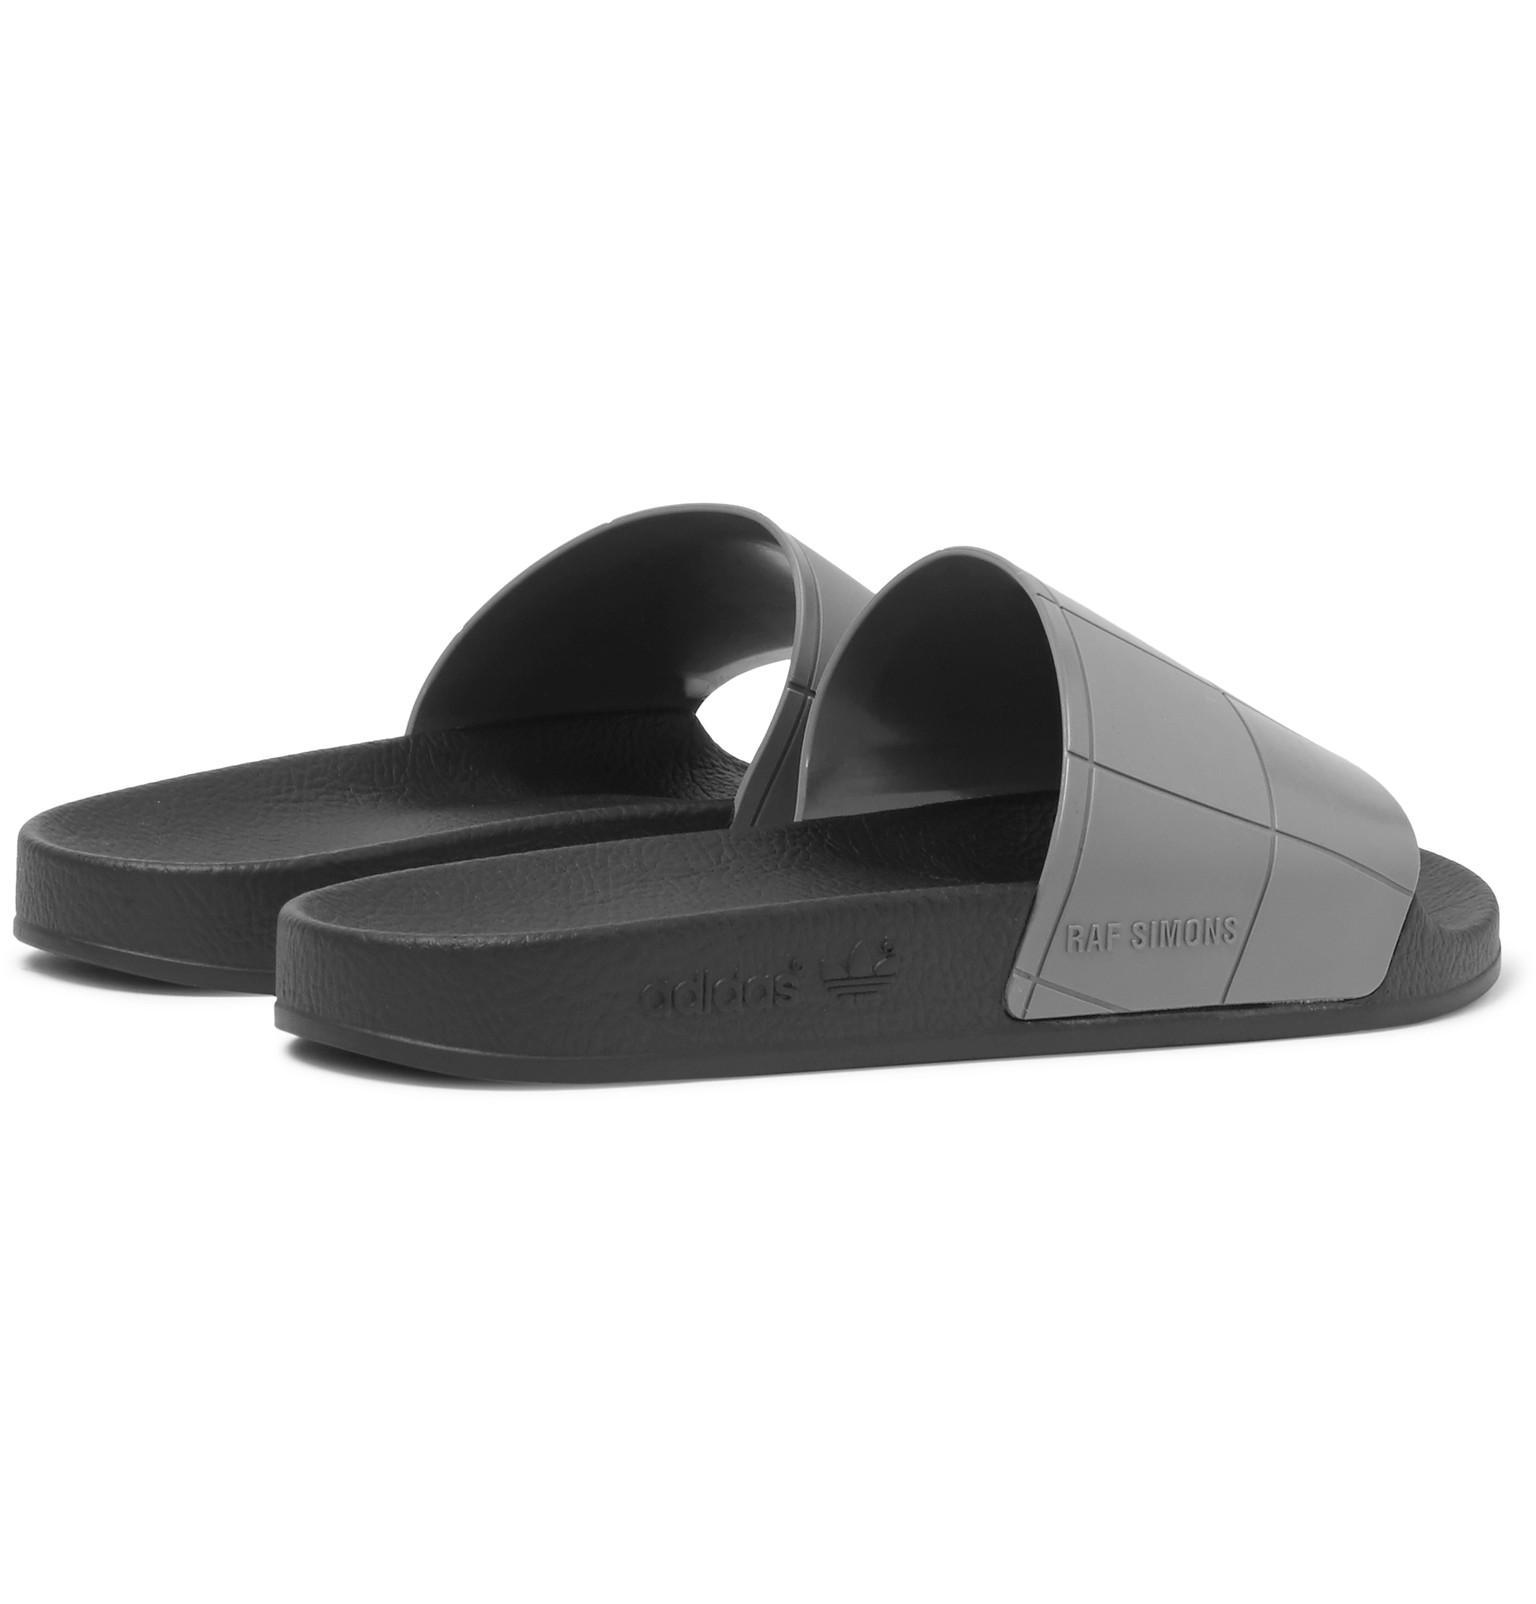 d1c3804a1 Lyst - Raf Simons + Adidas Originals Adilette Rubber Slides in Gray ...